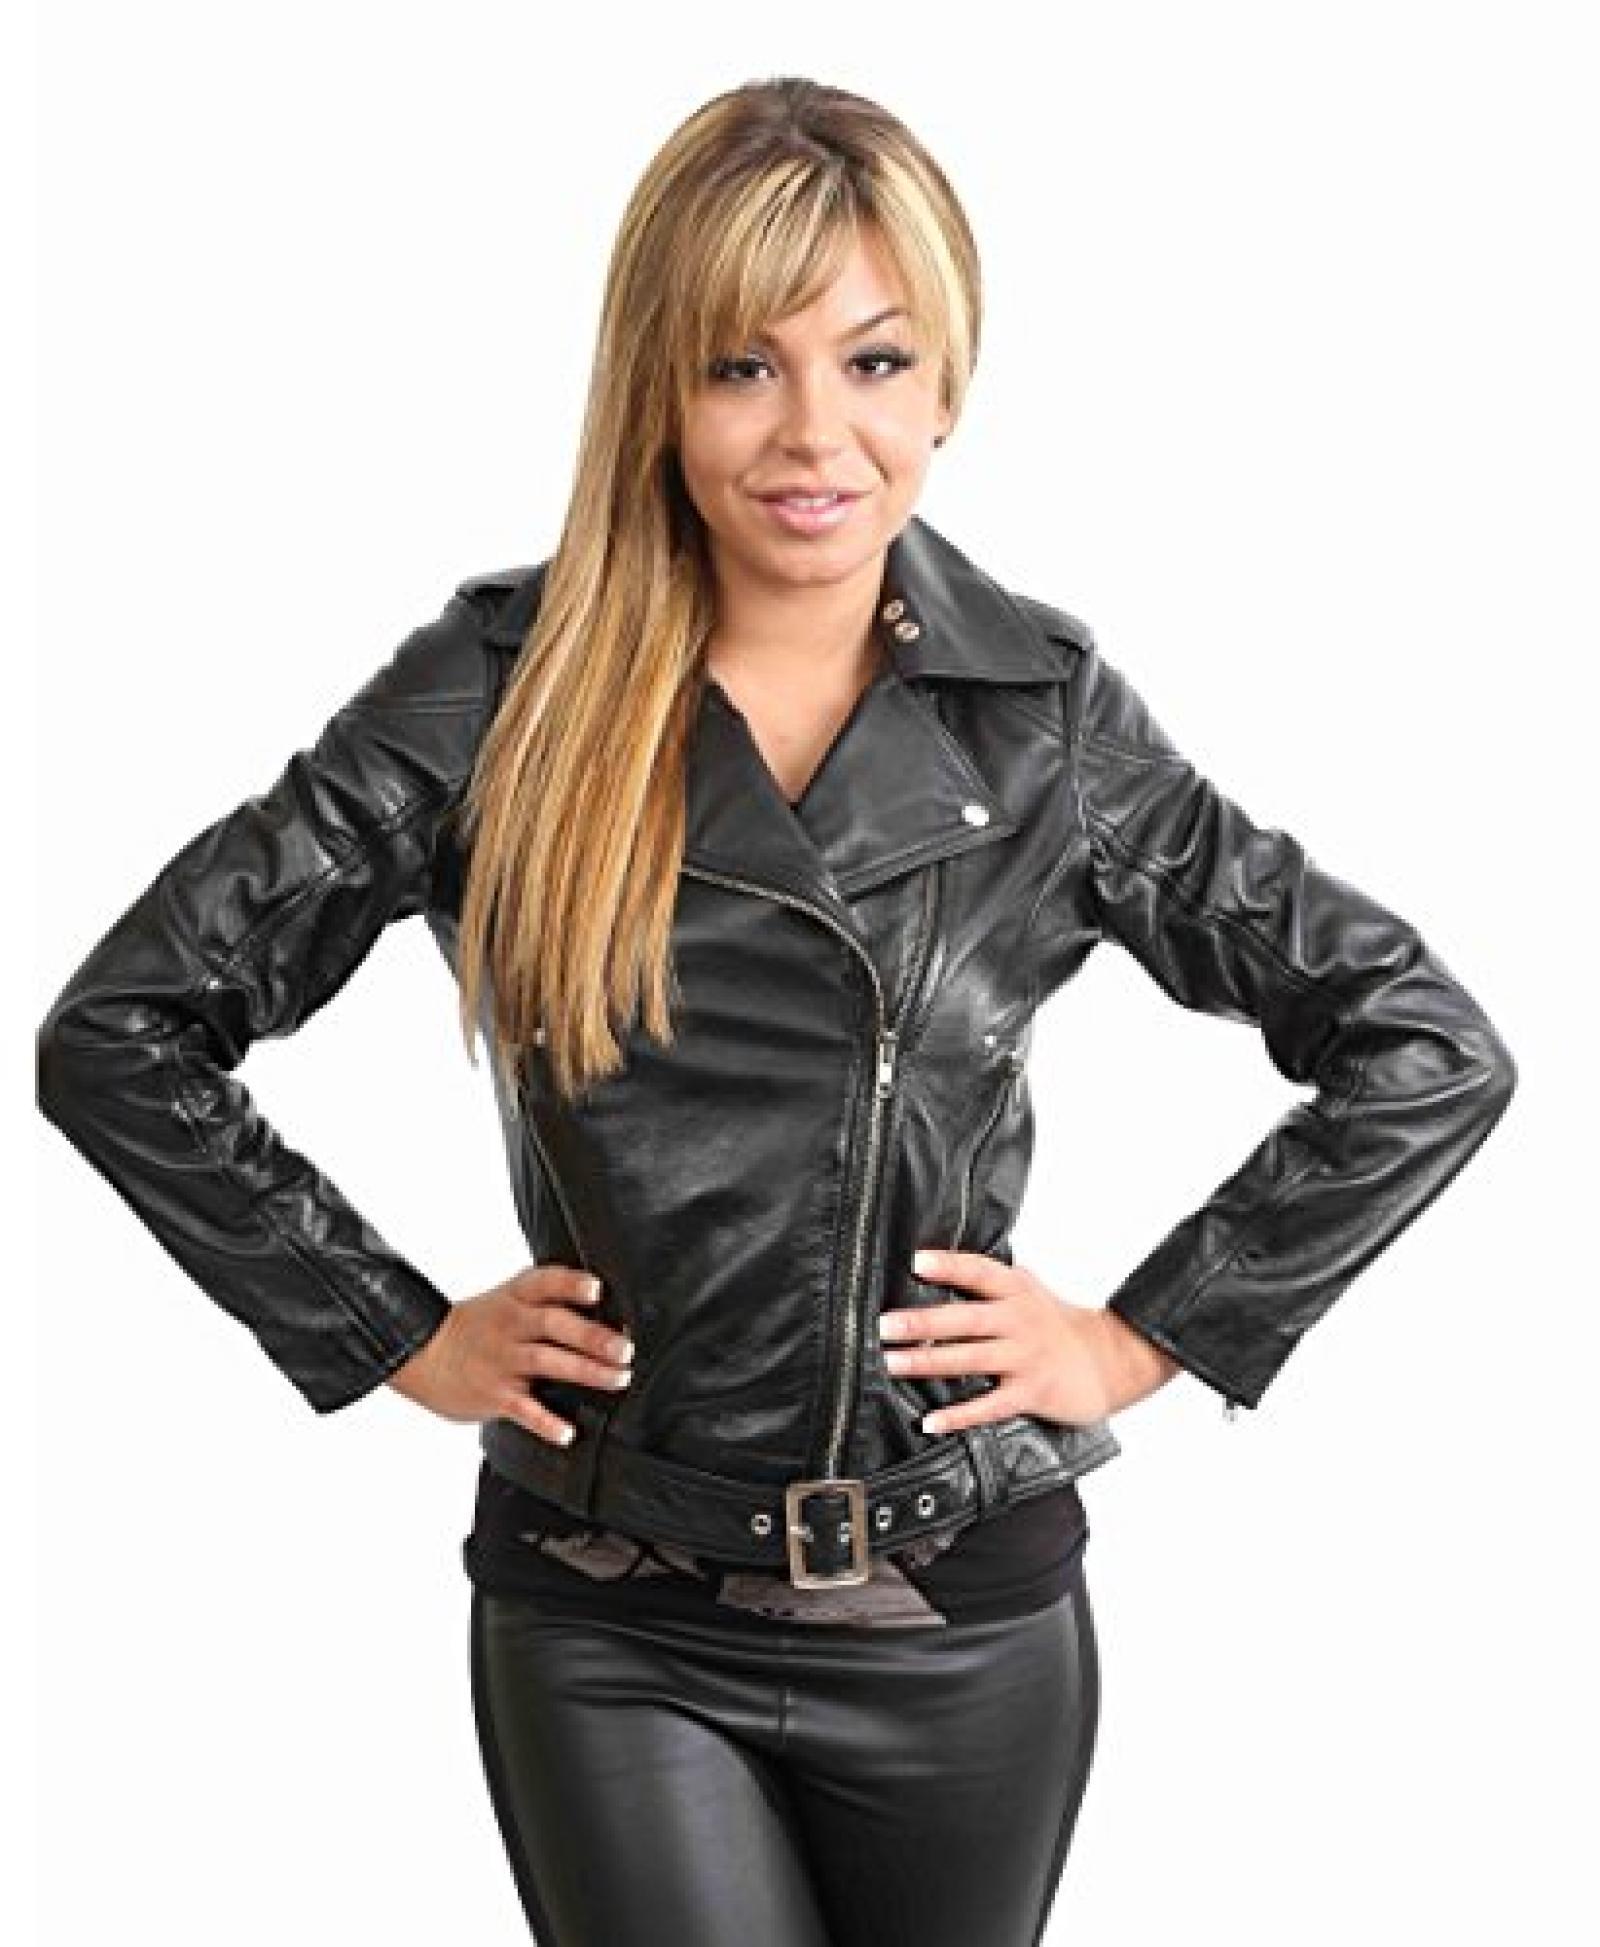 Damen kurze Biker Lederjacke für Frauen IVY Schwarz